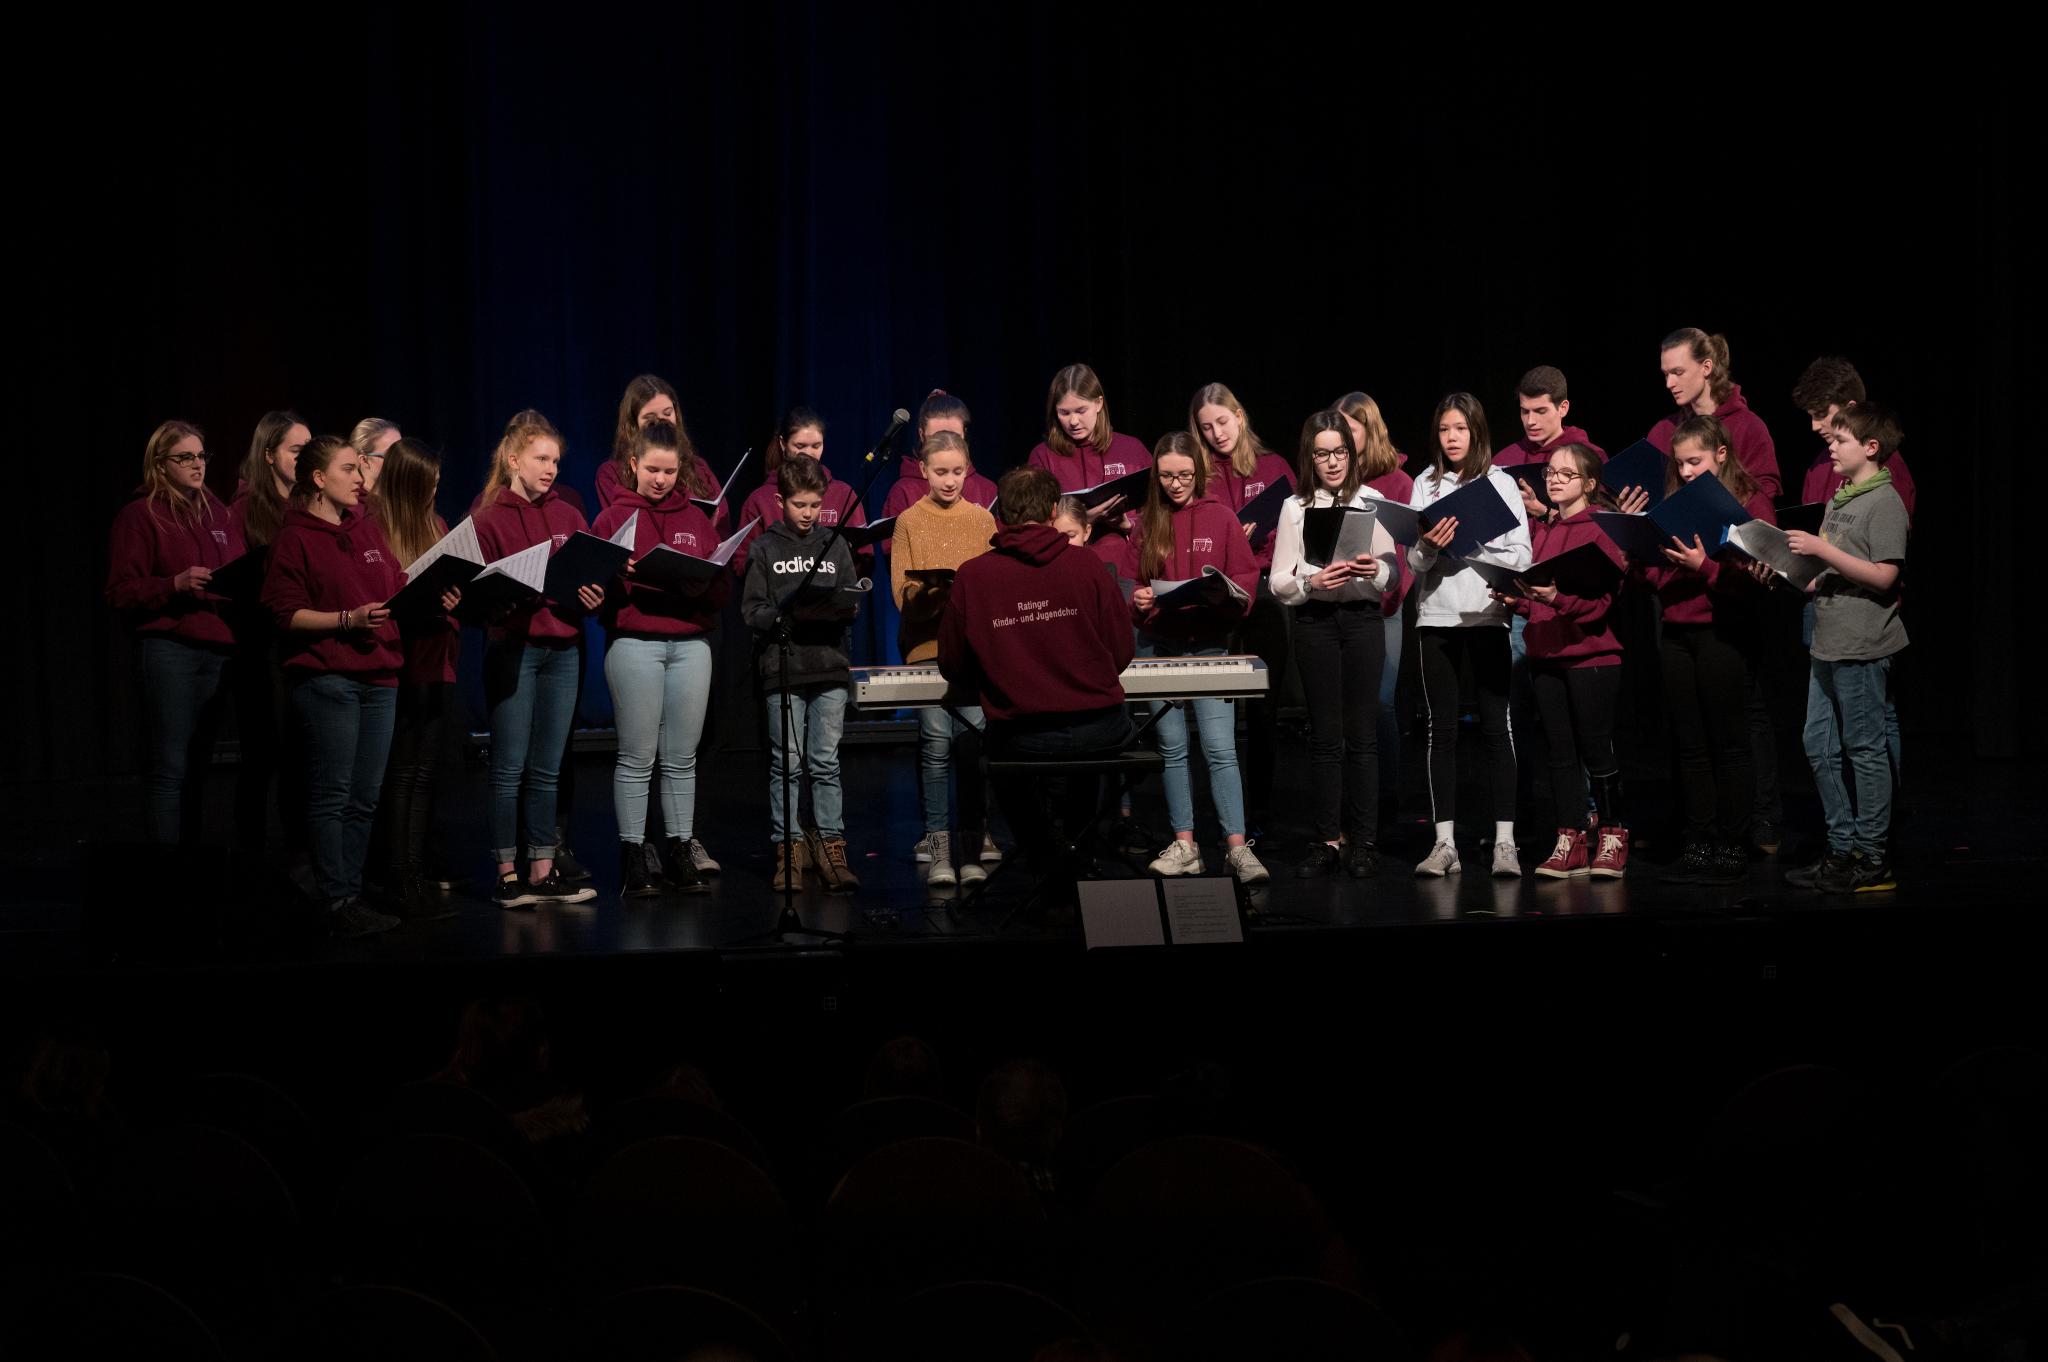 jugendkulturjahr-2020-ratingen-jkj2020-YouthDay-Musikschule-KinderundJugendchor